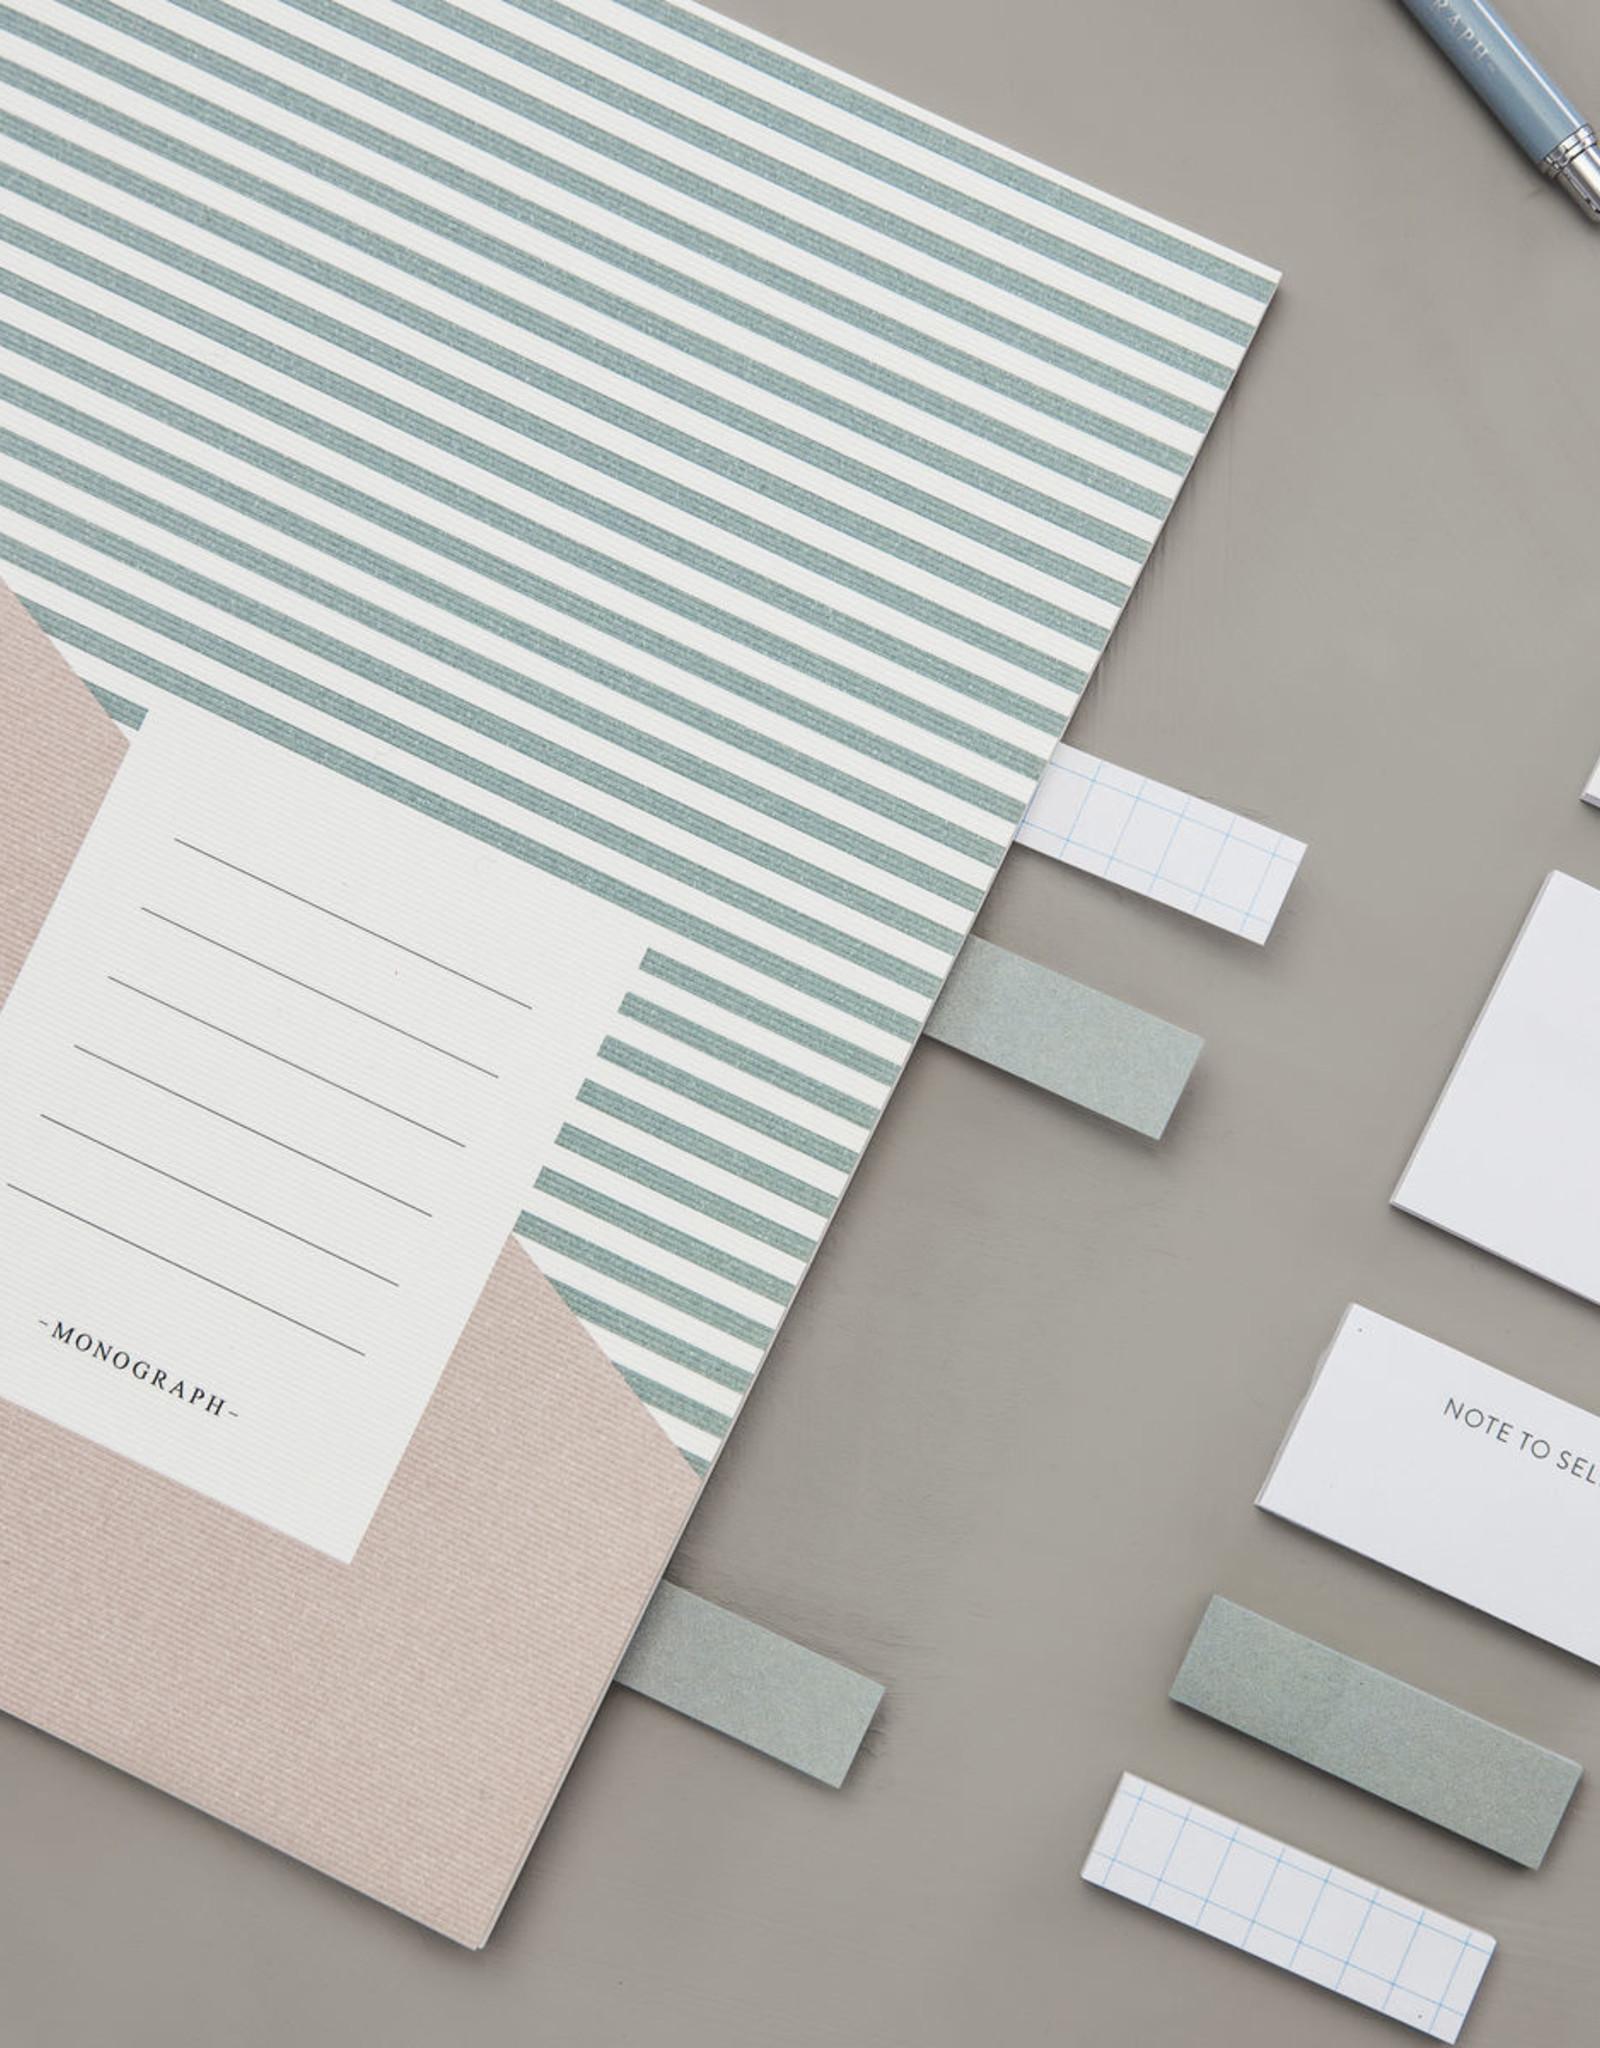 Monograph Monograph Note book Stripes Combo 1  A5  Set of 2 designs